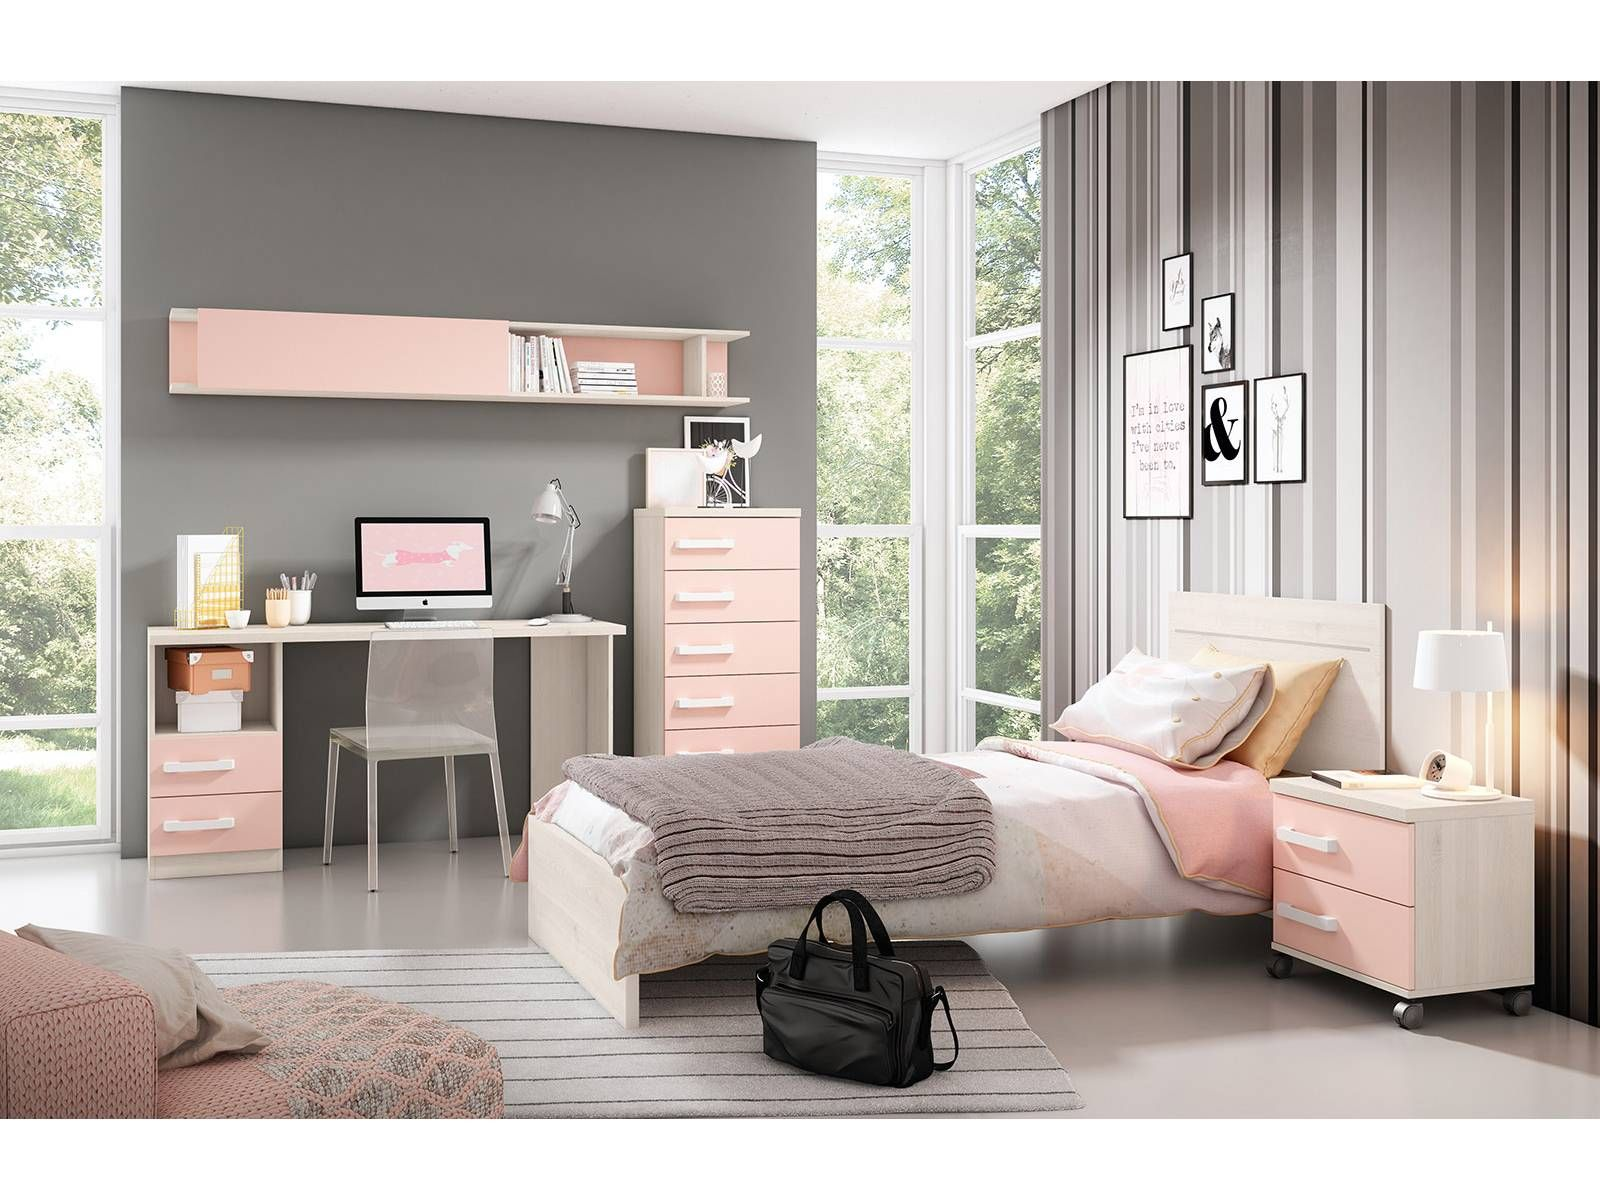 Resultado de imagen para dormitorios juveniles modernos